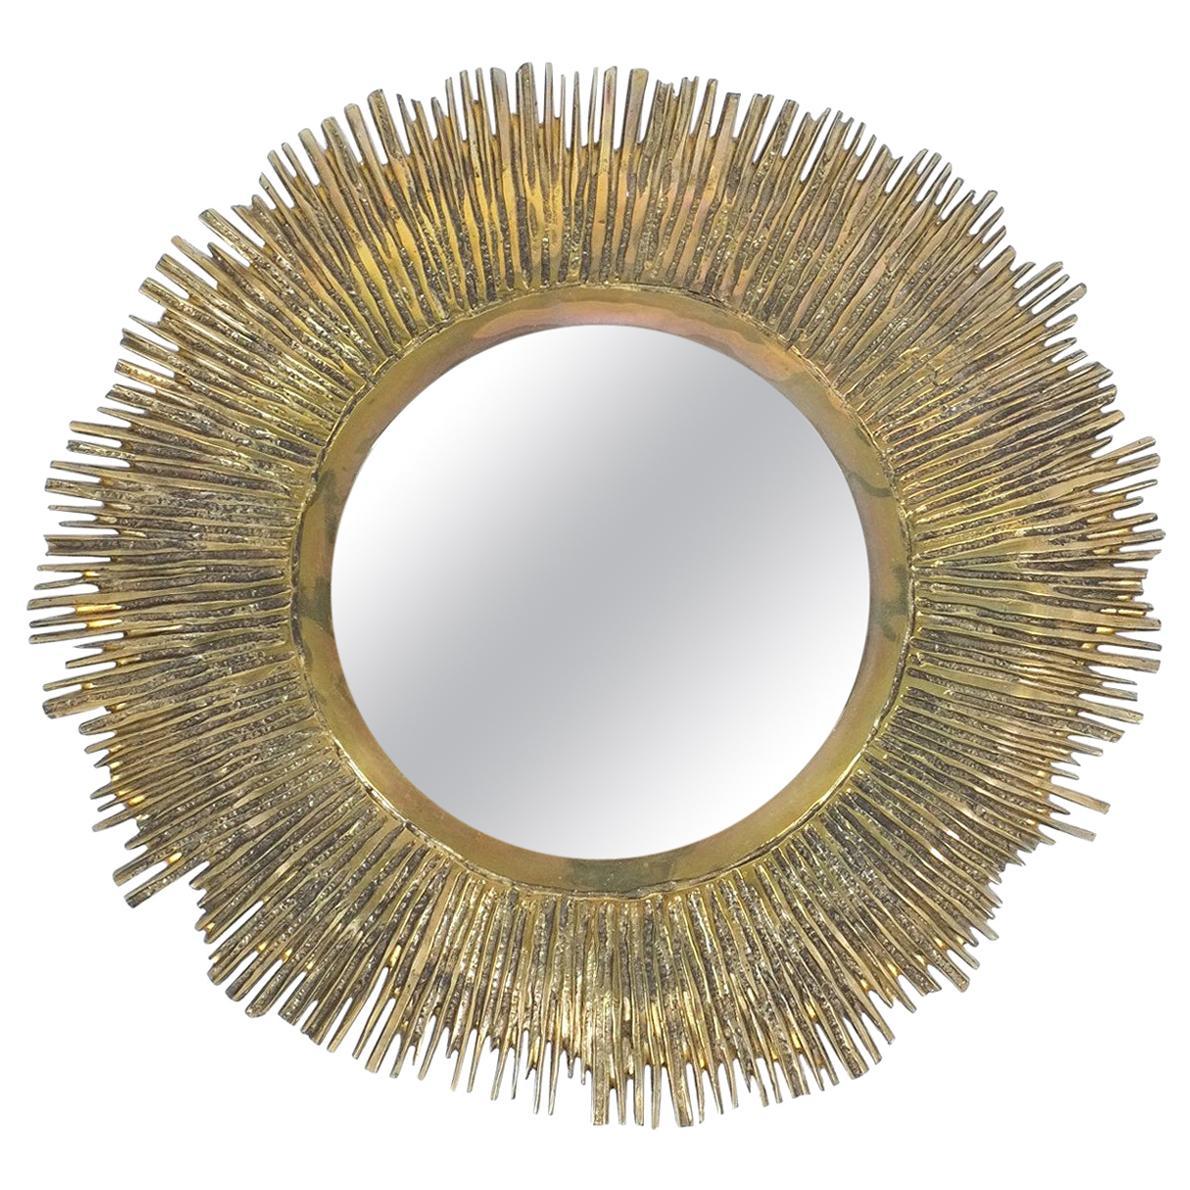 Solid Brass Sunburst Midcentury Mirror, France, circa 1955